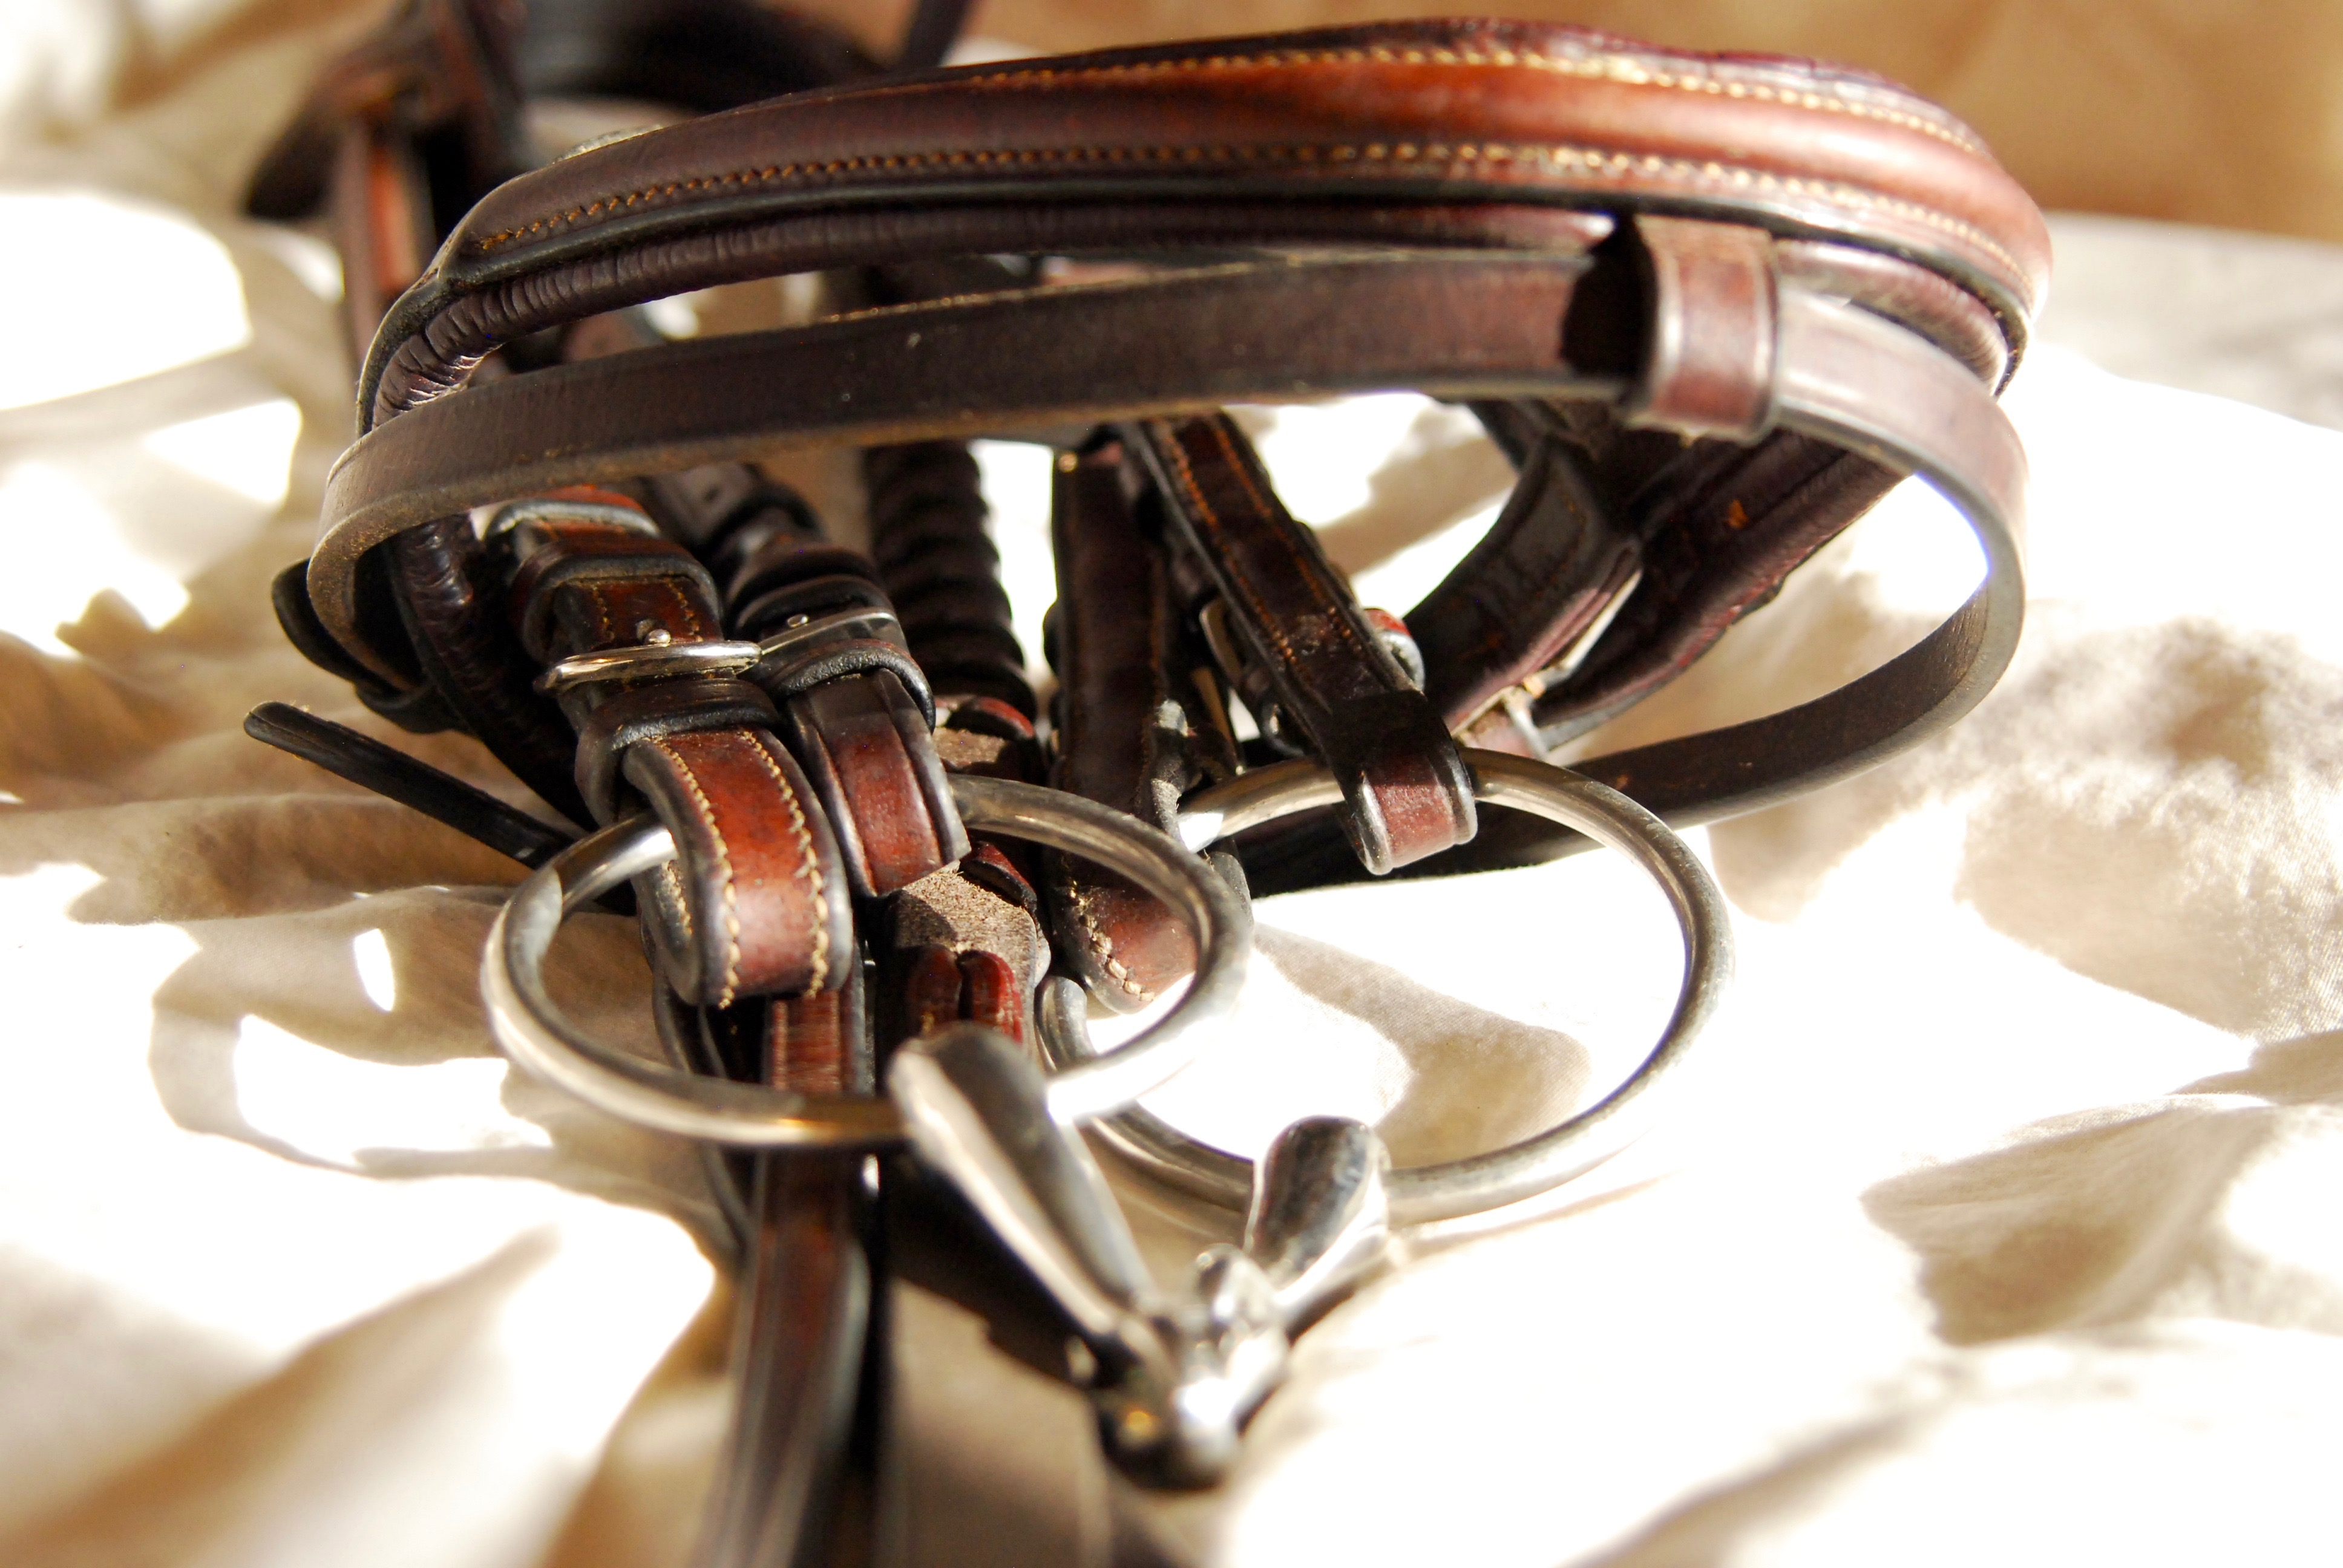 Clean bridle